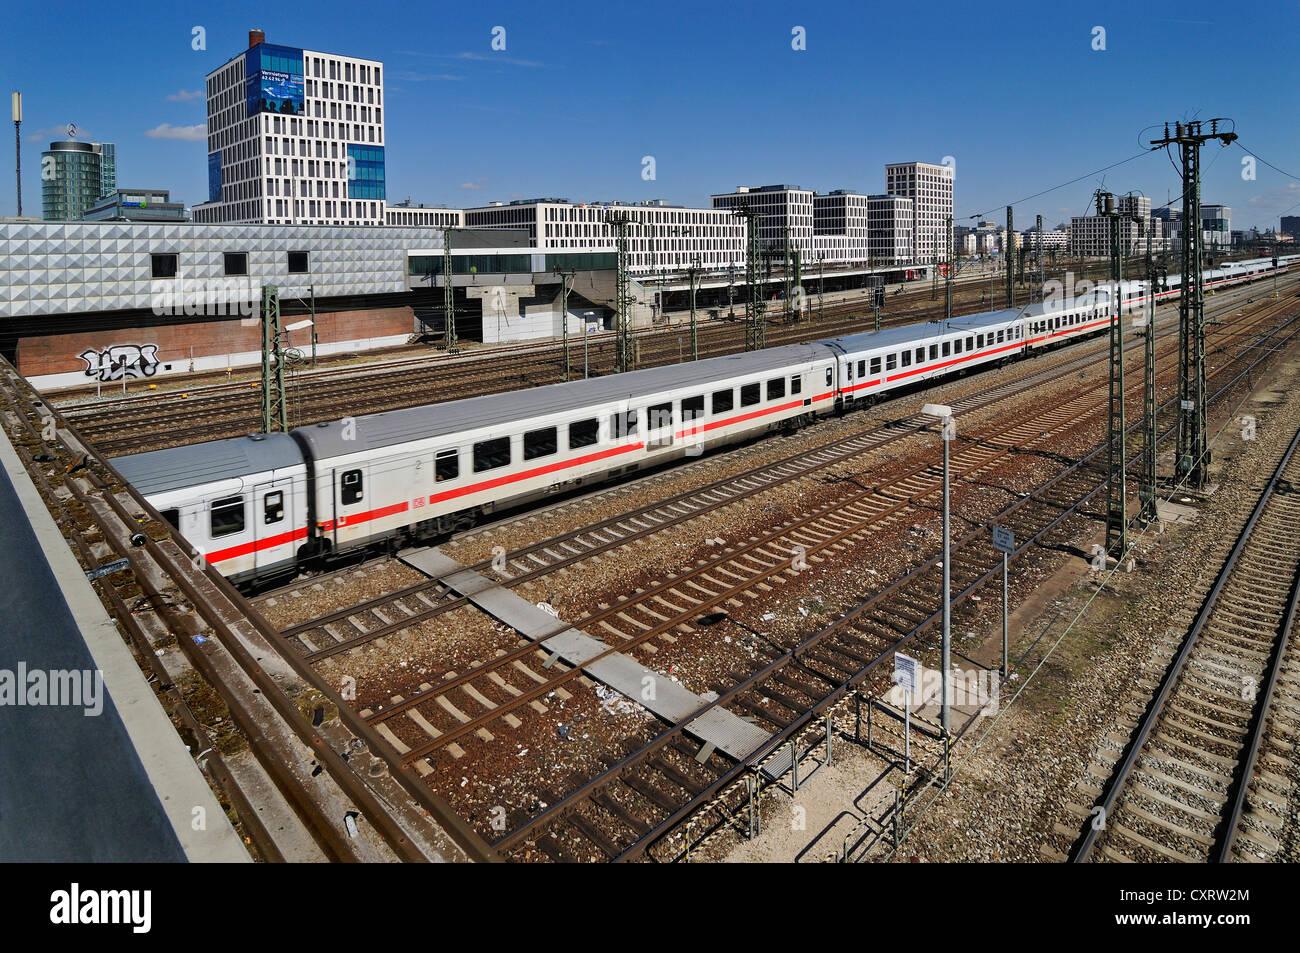 Trackage or railway tracks near Donnersbergerbruecke bridge, Munich, Bavaria - Stock Image